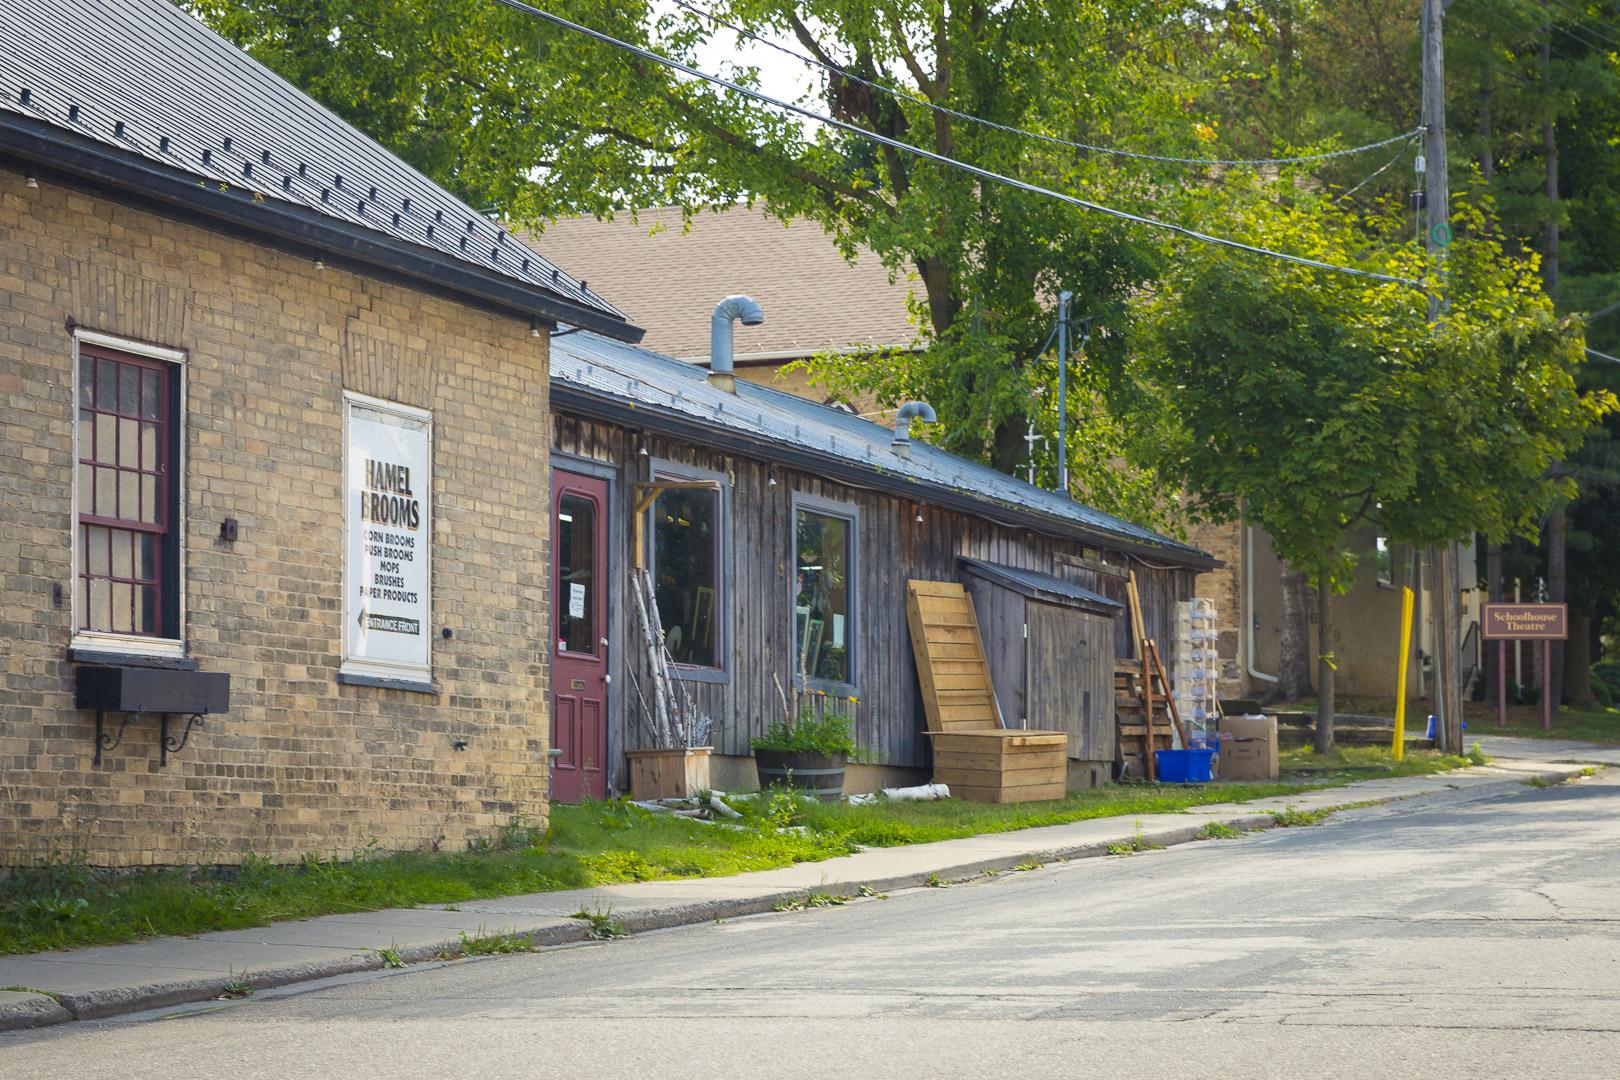 Hamel Brooms (Was:  Jon B. Martin Blacksmith Shop) and Robert a Brown Glass & Metal Studio